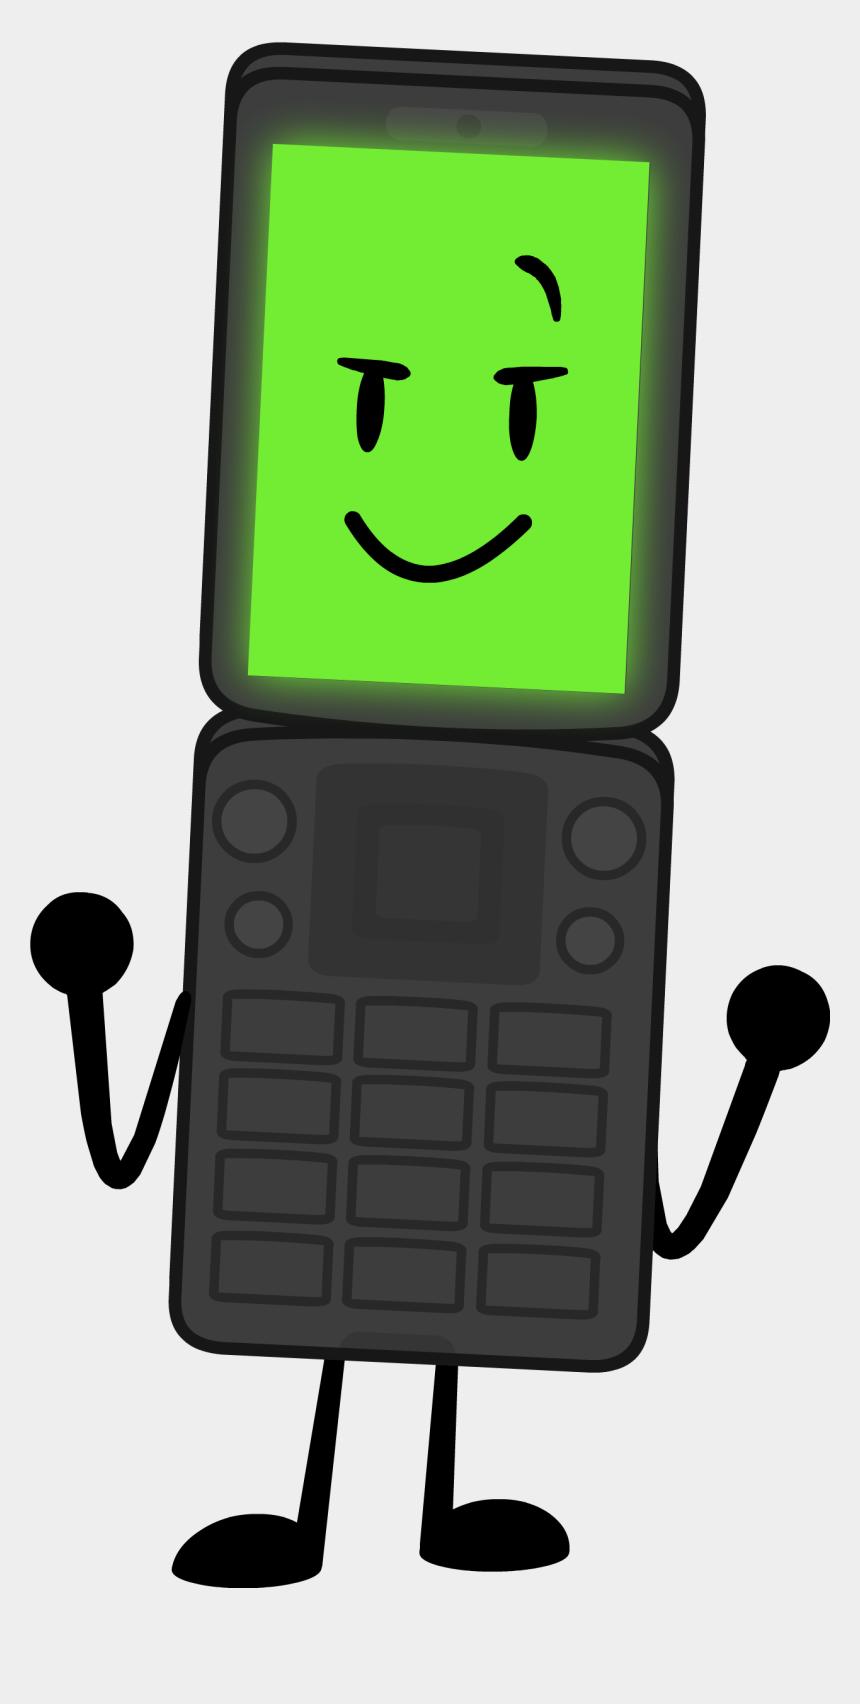 flip phone clip art, Cartoons - The Bfc Wiki - Cartoon